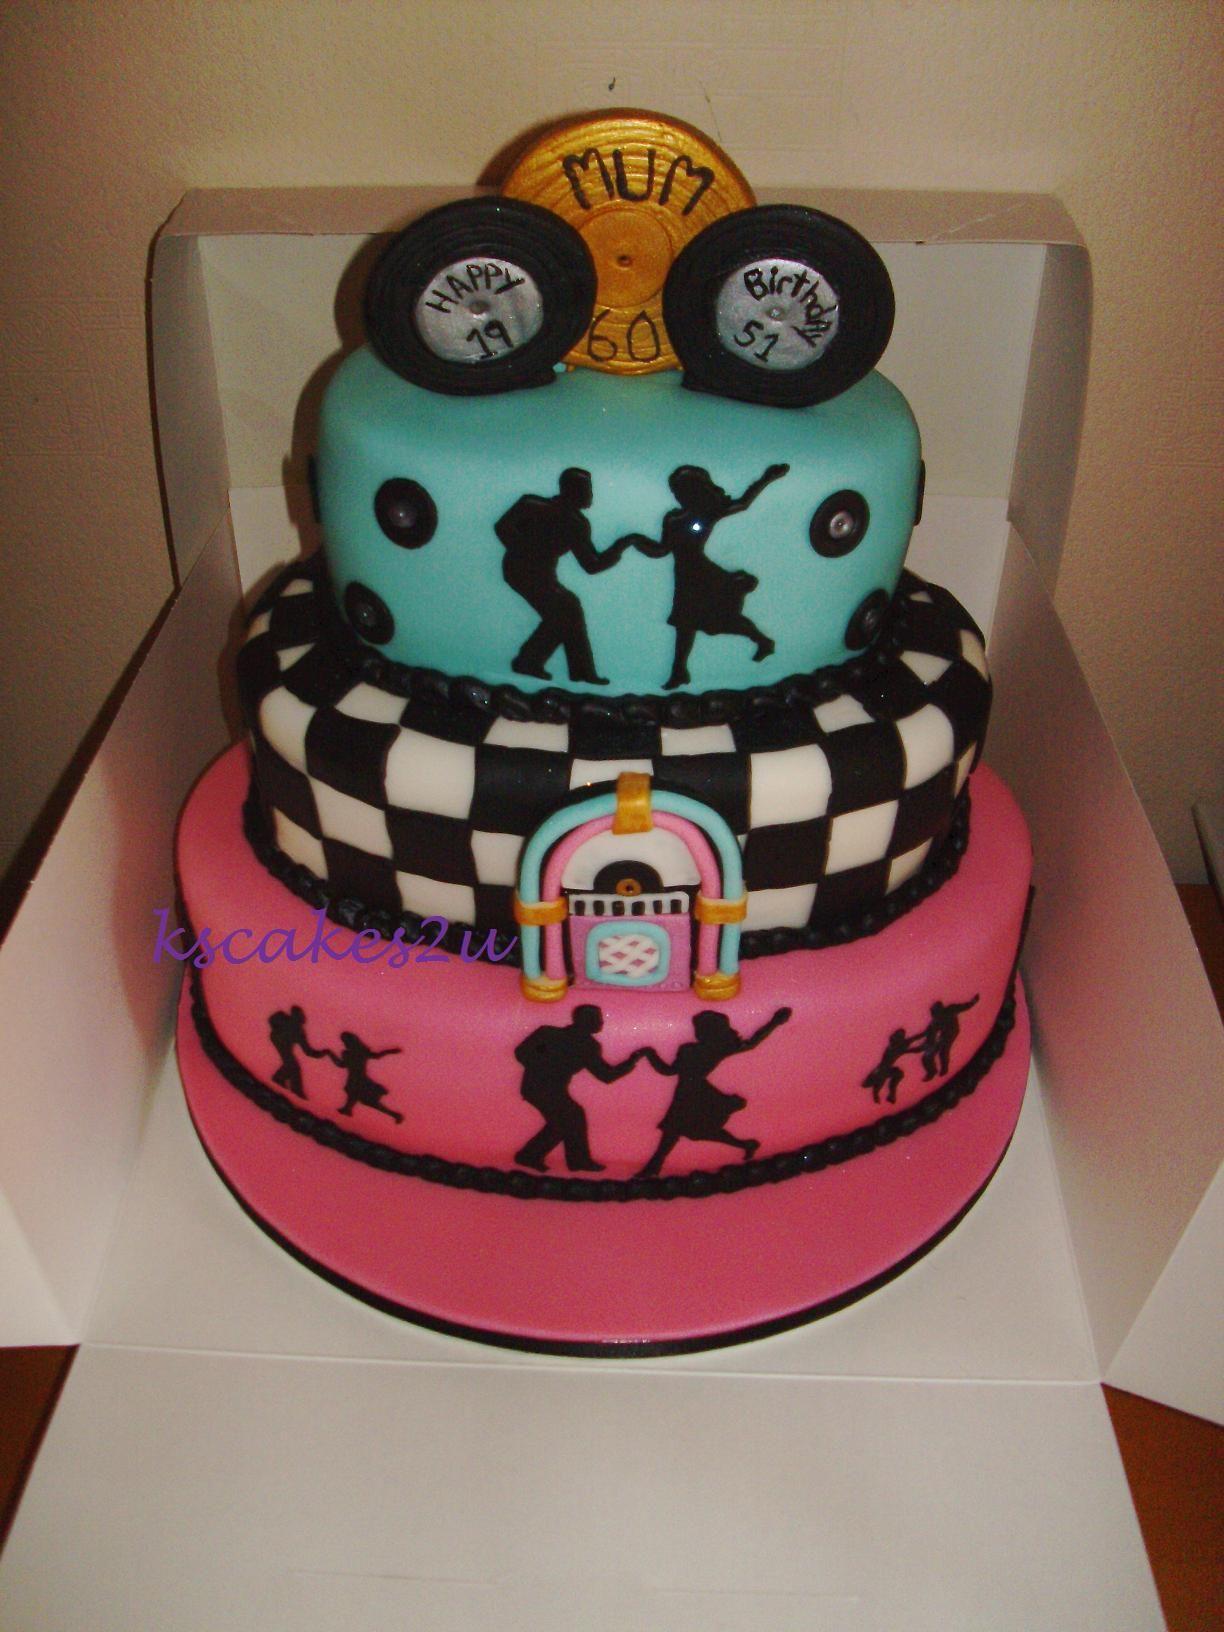 1950s Theme 3 Tier Oval Birthday Cake